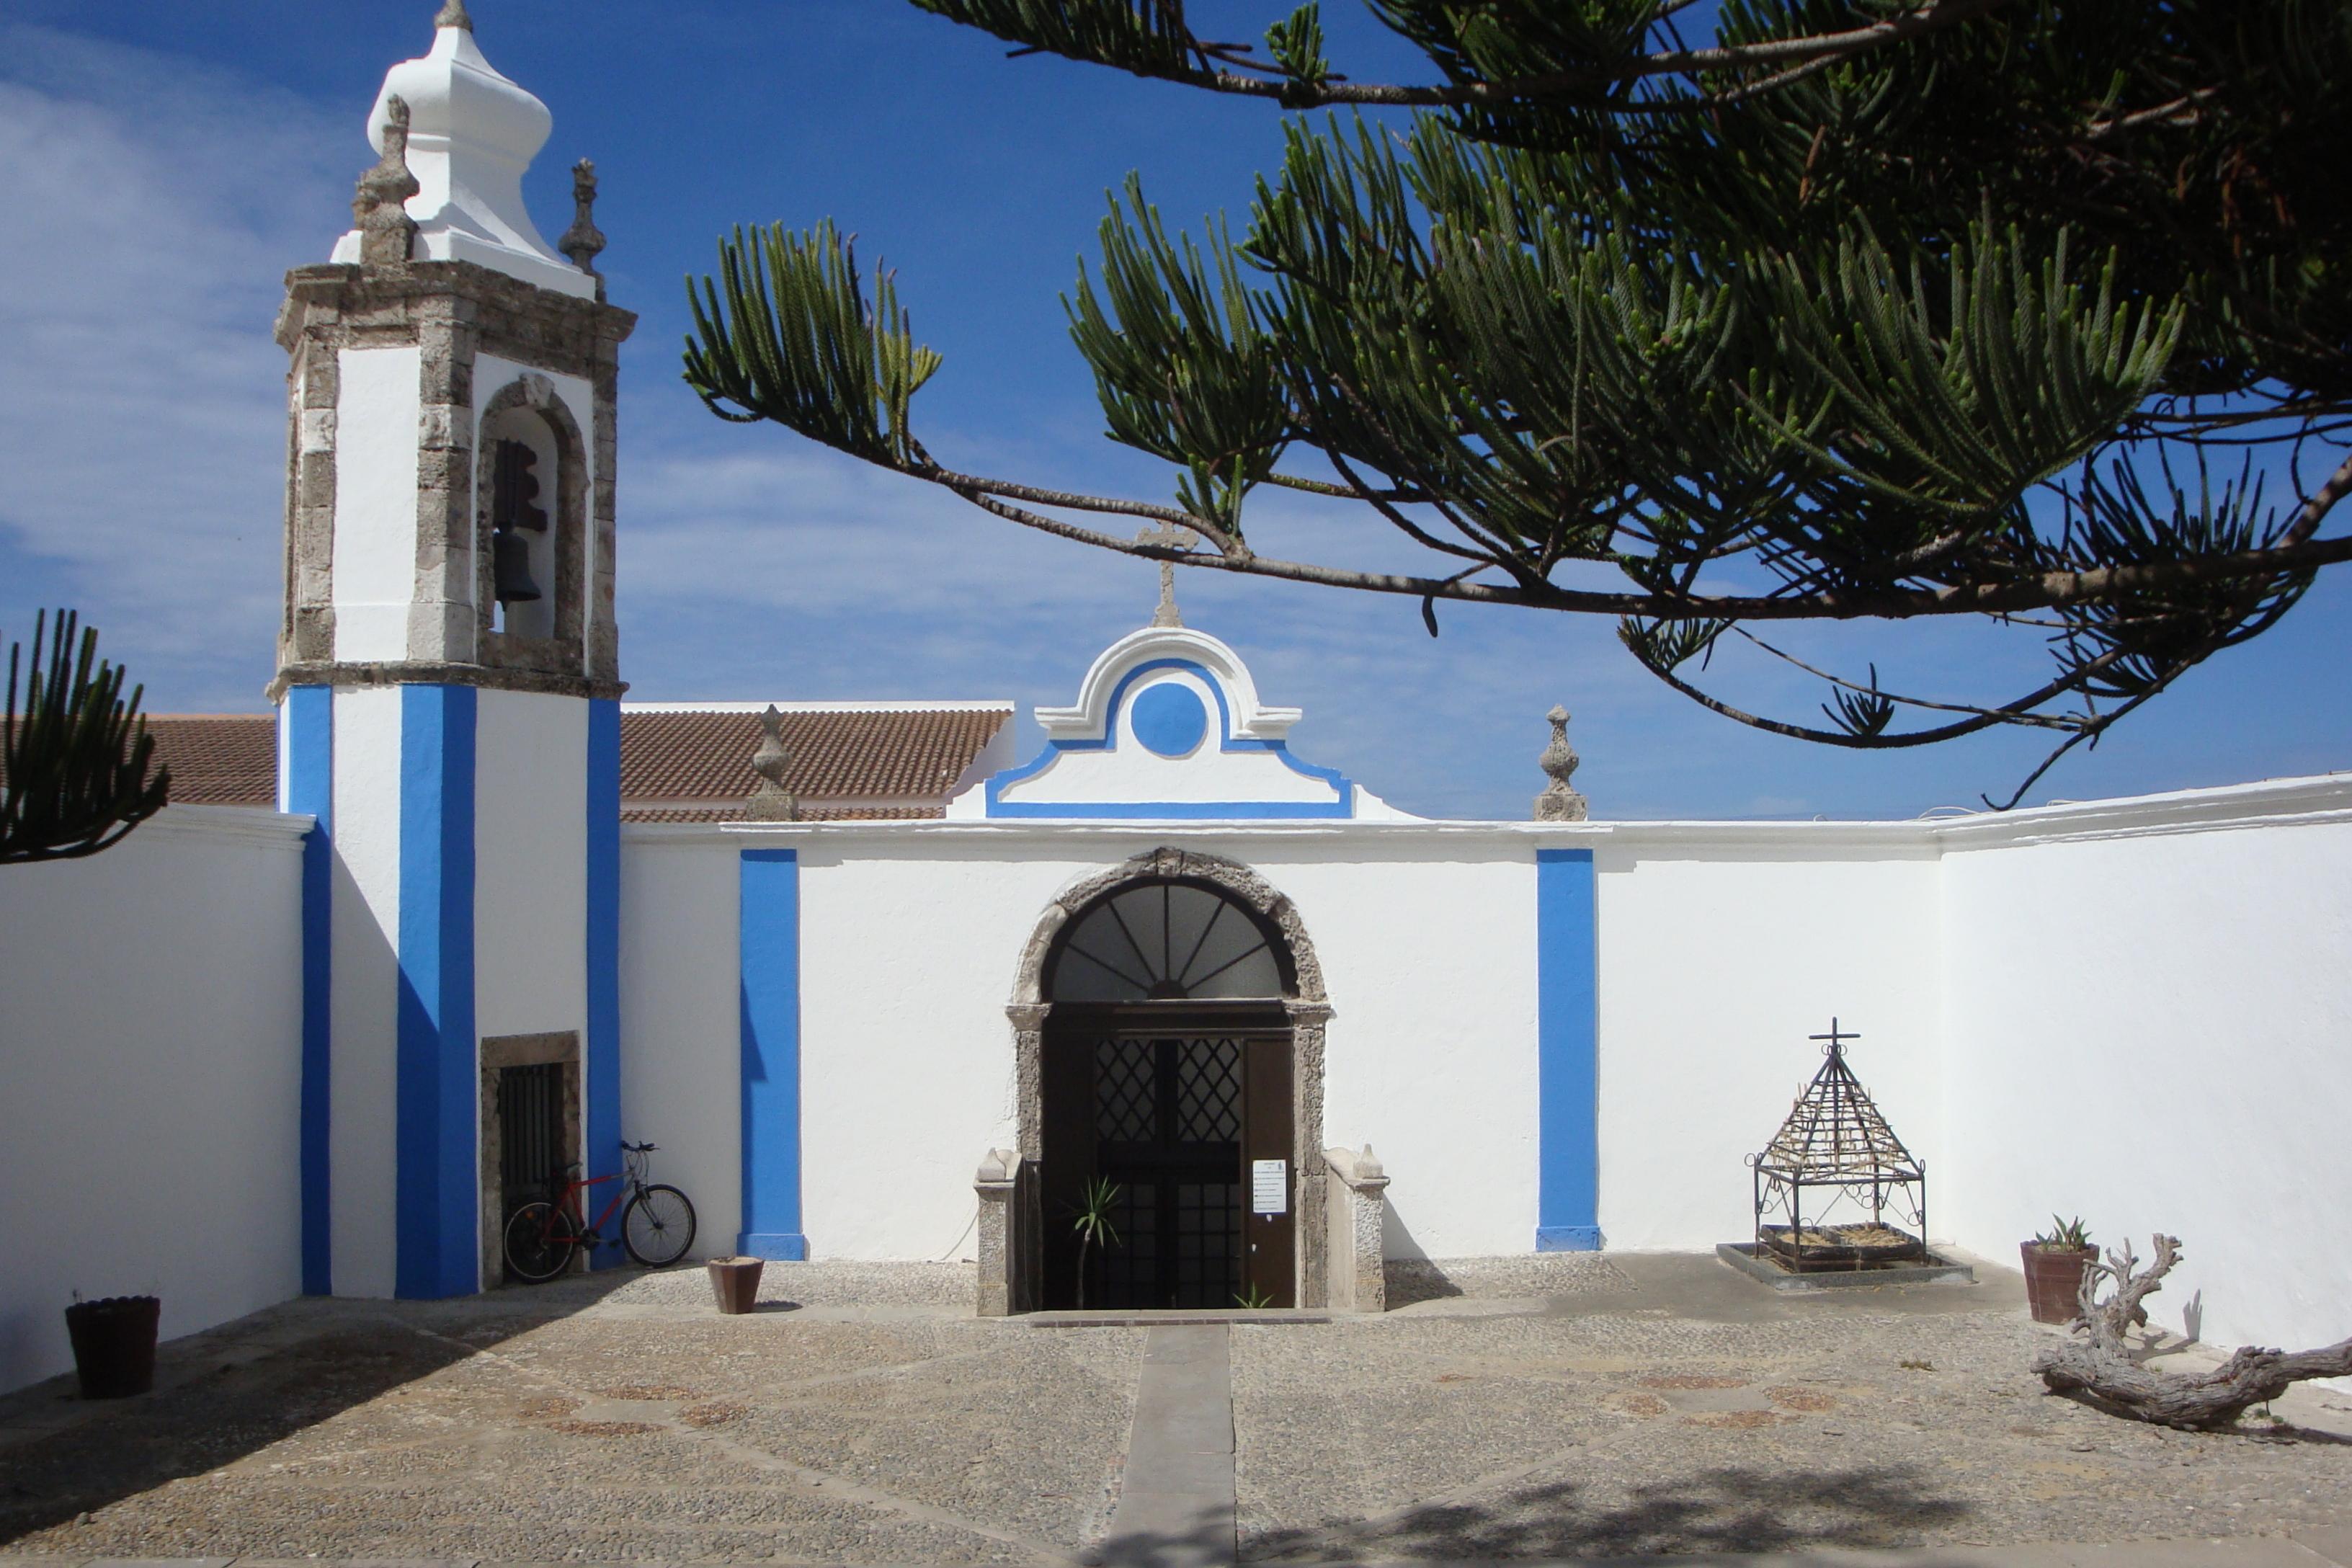 Archivo:Santuario Nossa Senhora Remedios Peniche.jpg - Wikipedia, la  enciclopedia libre